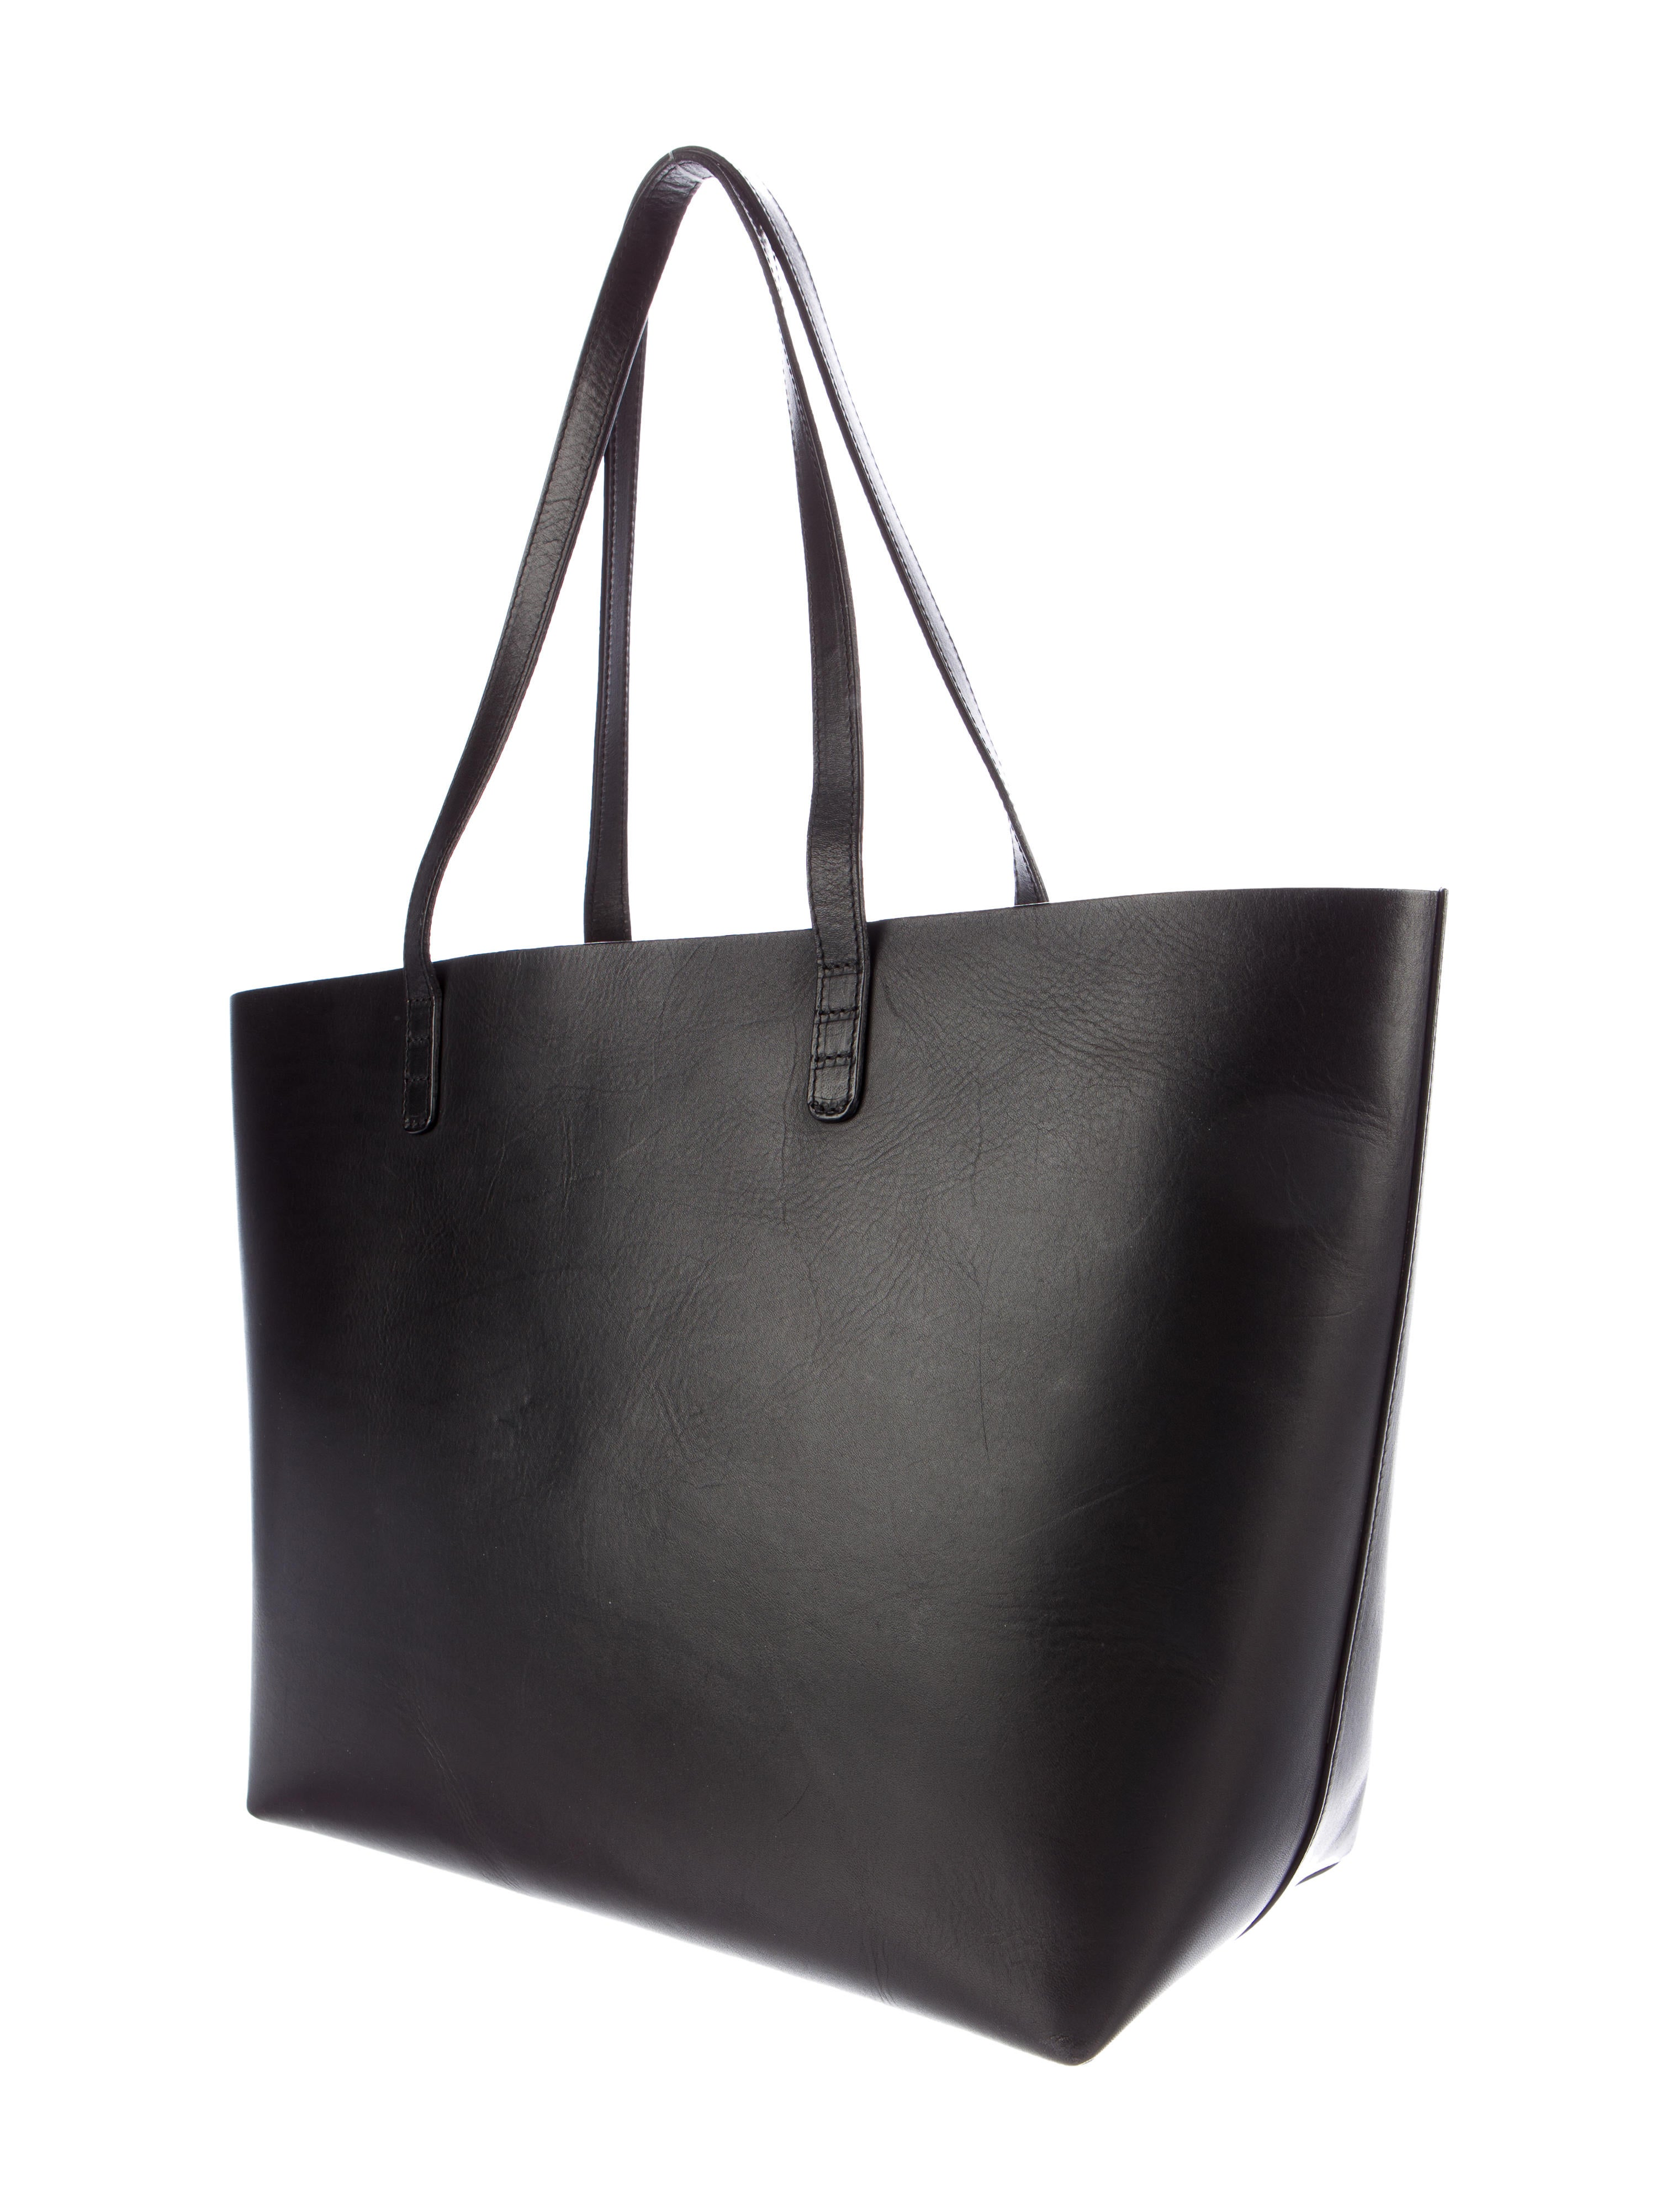 You're in Handbags & Totes